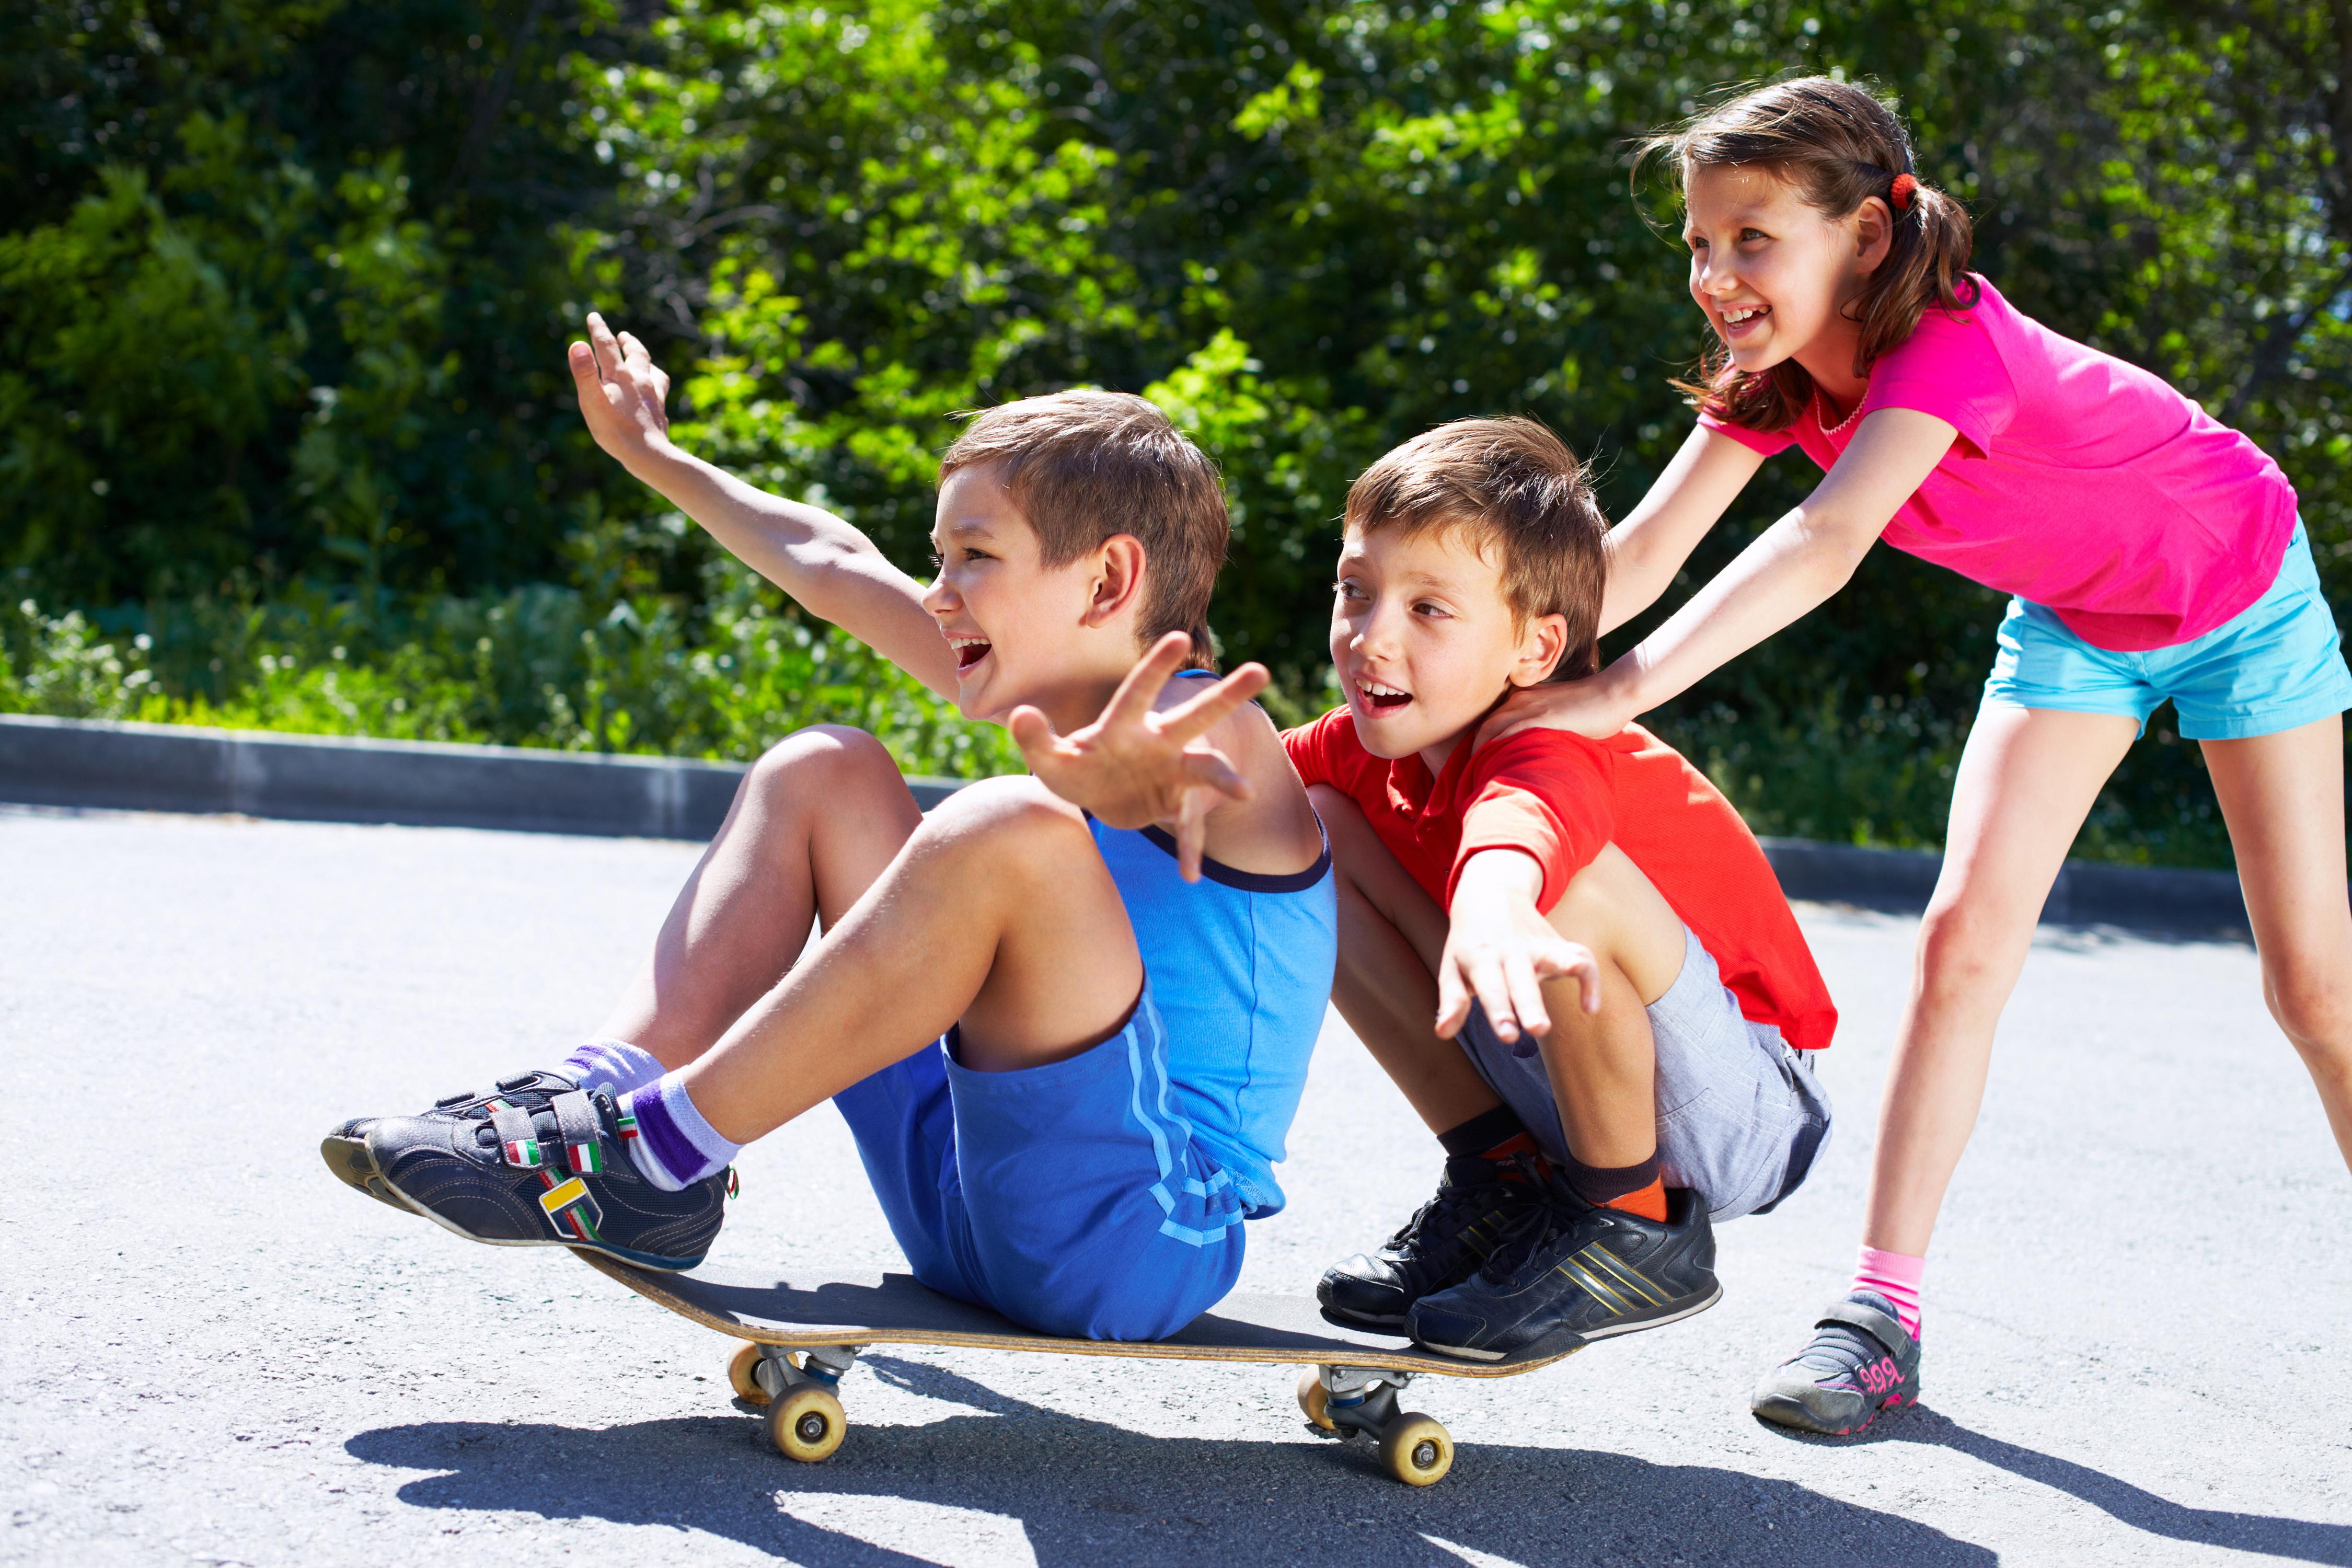 Behavioural benefits of play